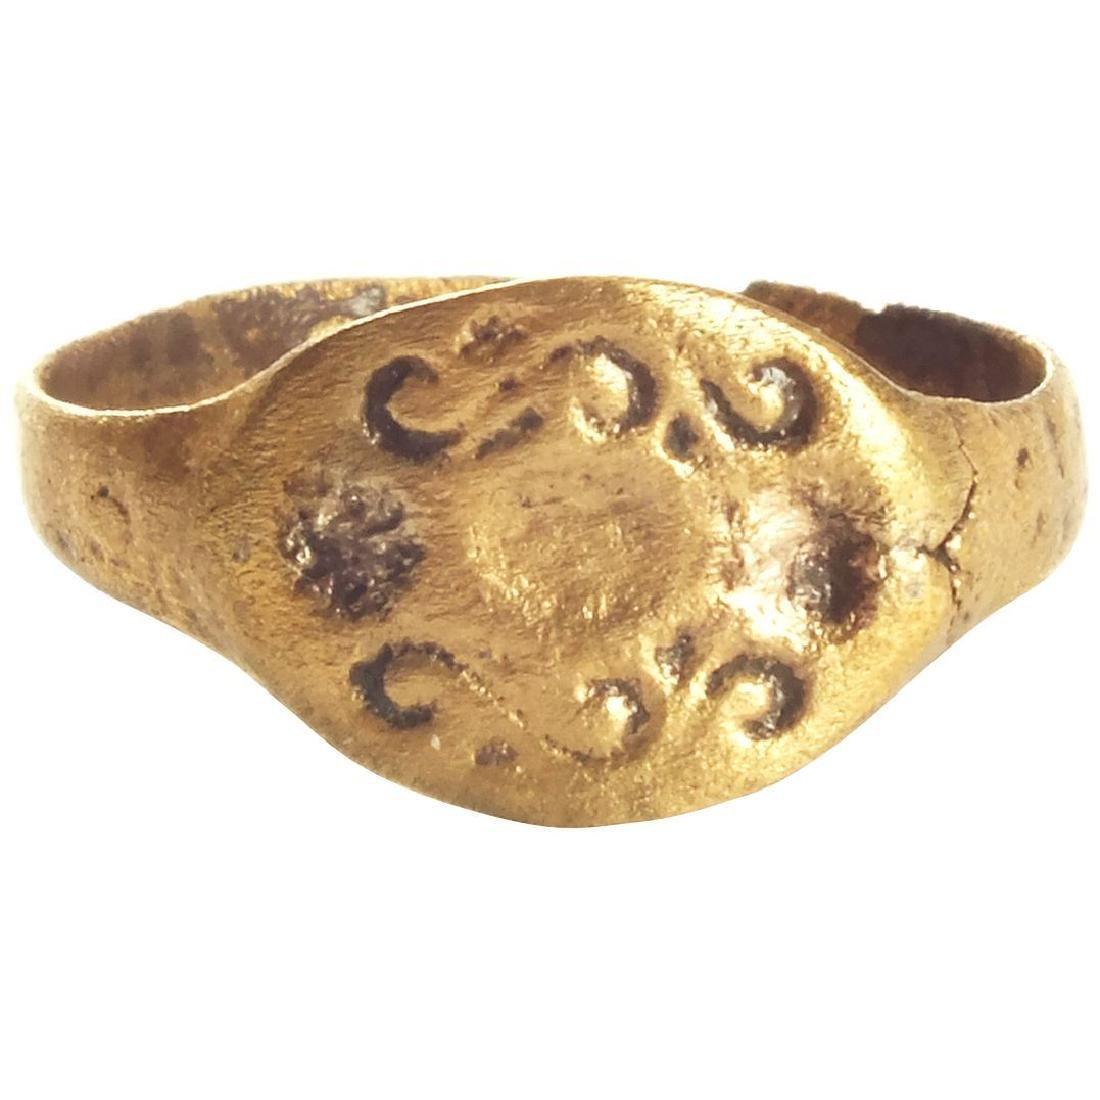 ROMAN SORCERER'S RING C.300-100 BC